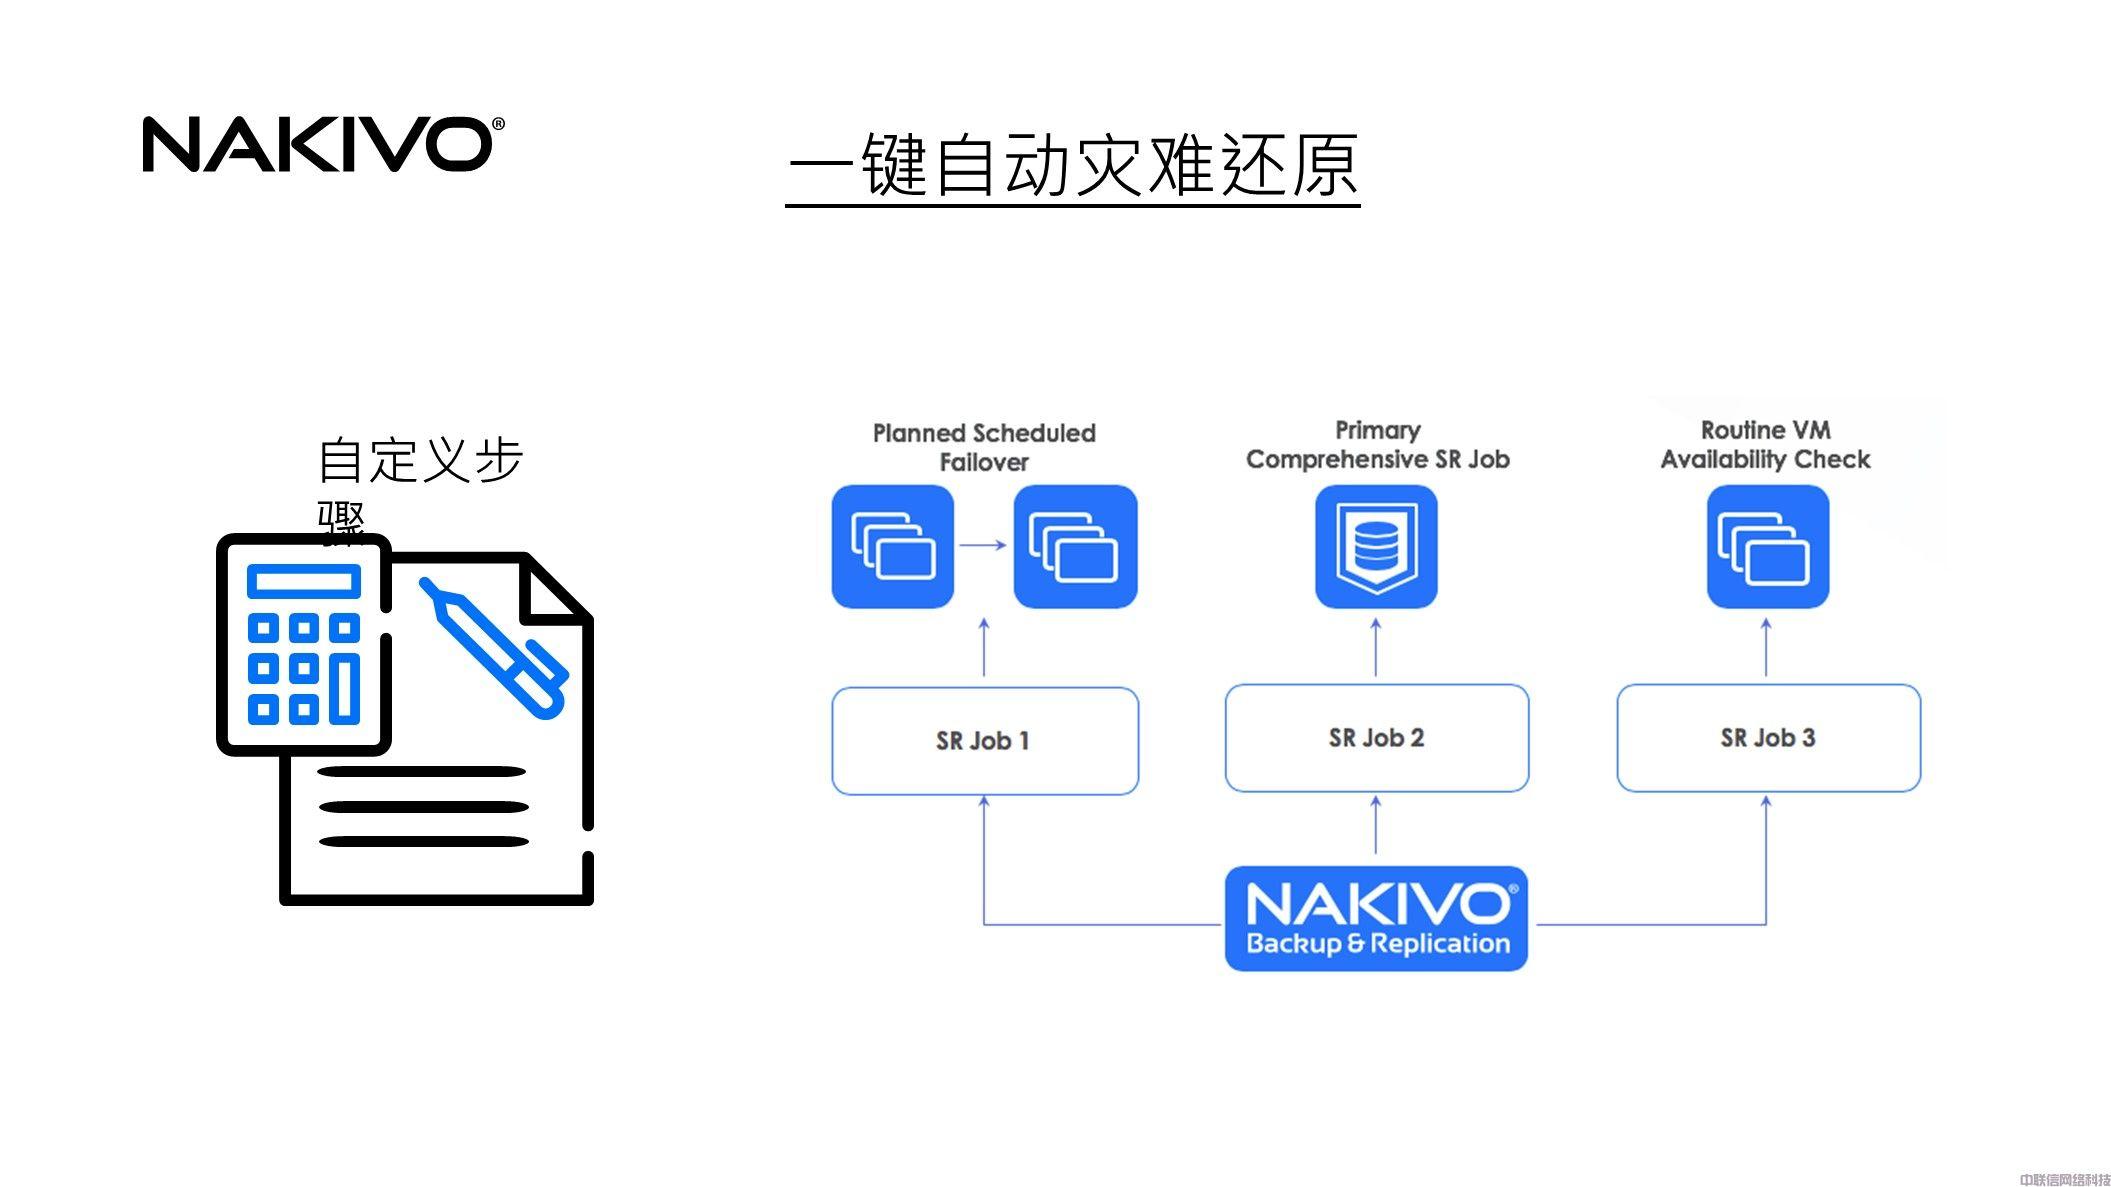 虚拟化备份方案NAKIVO Backup & Replication(图22)